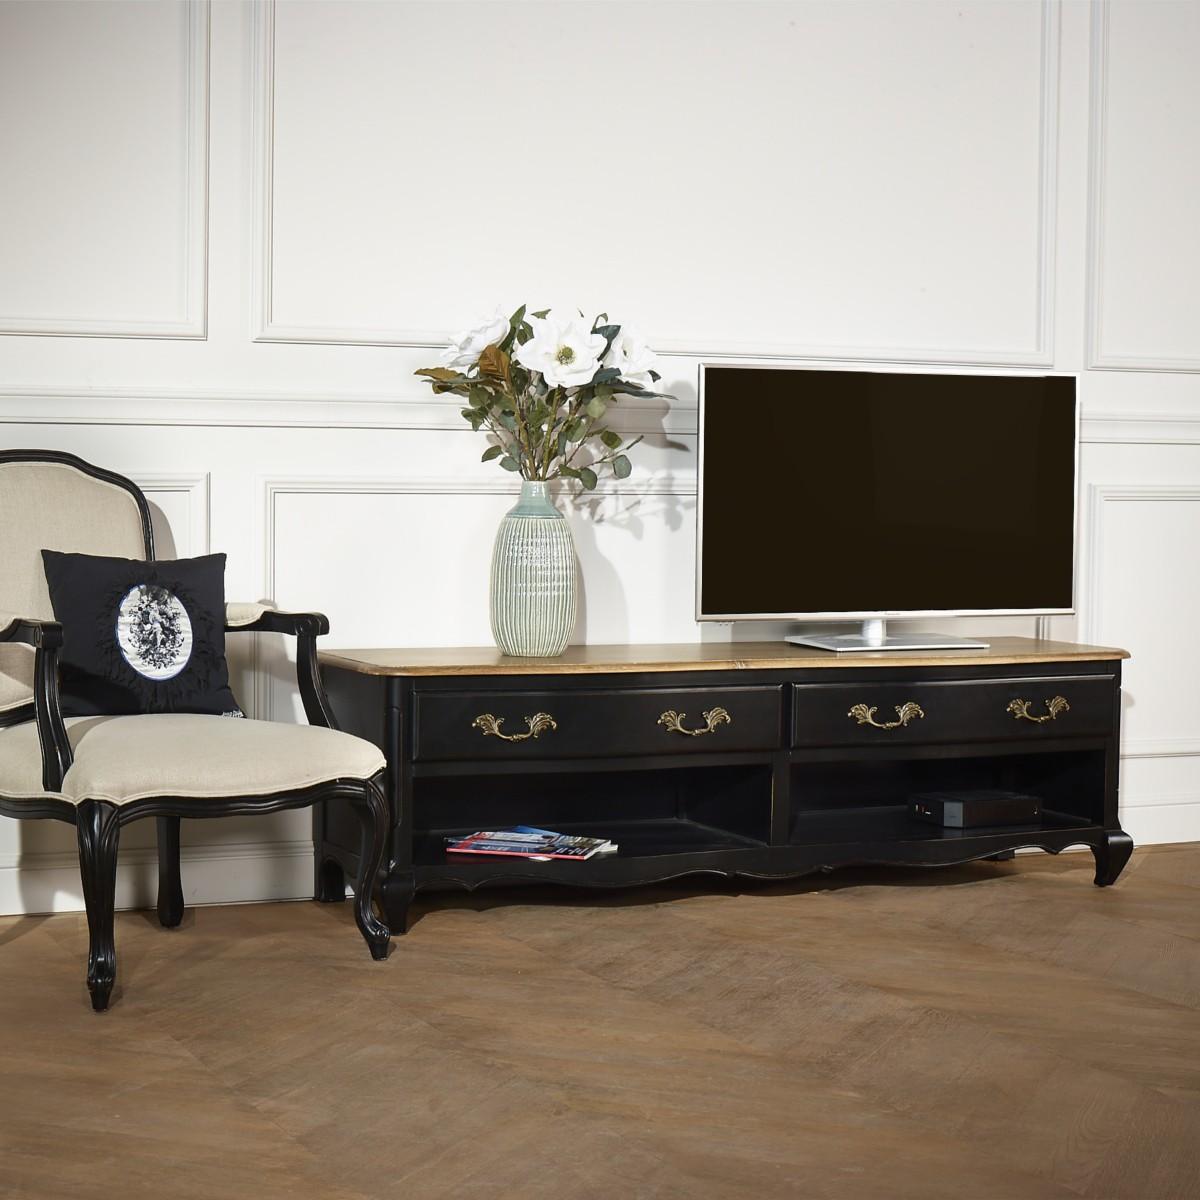 Meuble Tv Grande Taille meuble tv savoy, 2 niches, 2 tiroirs, noir